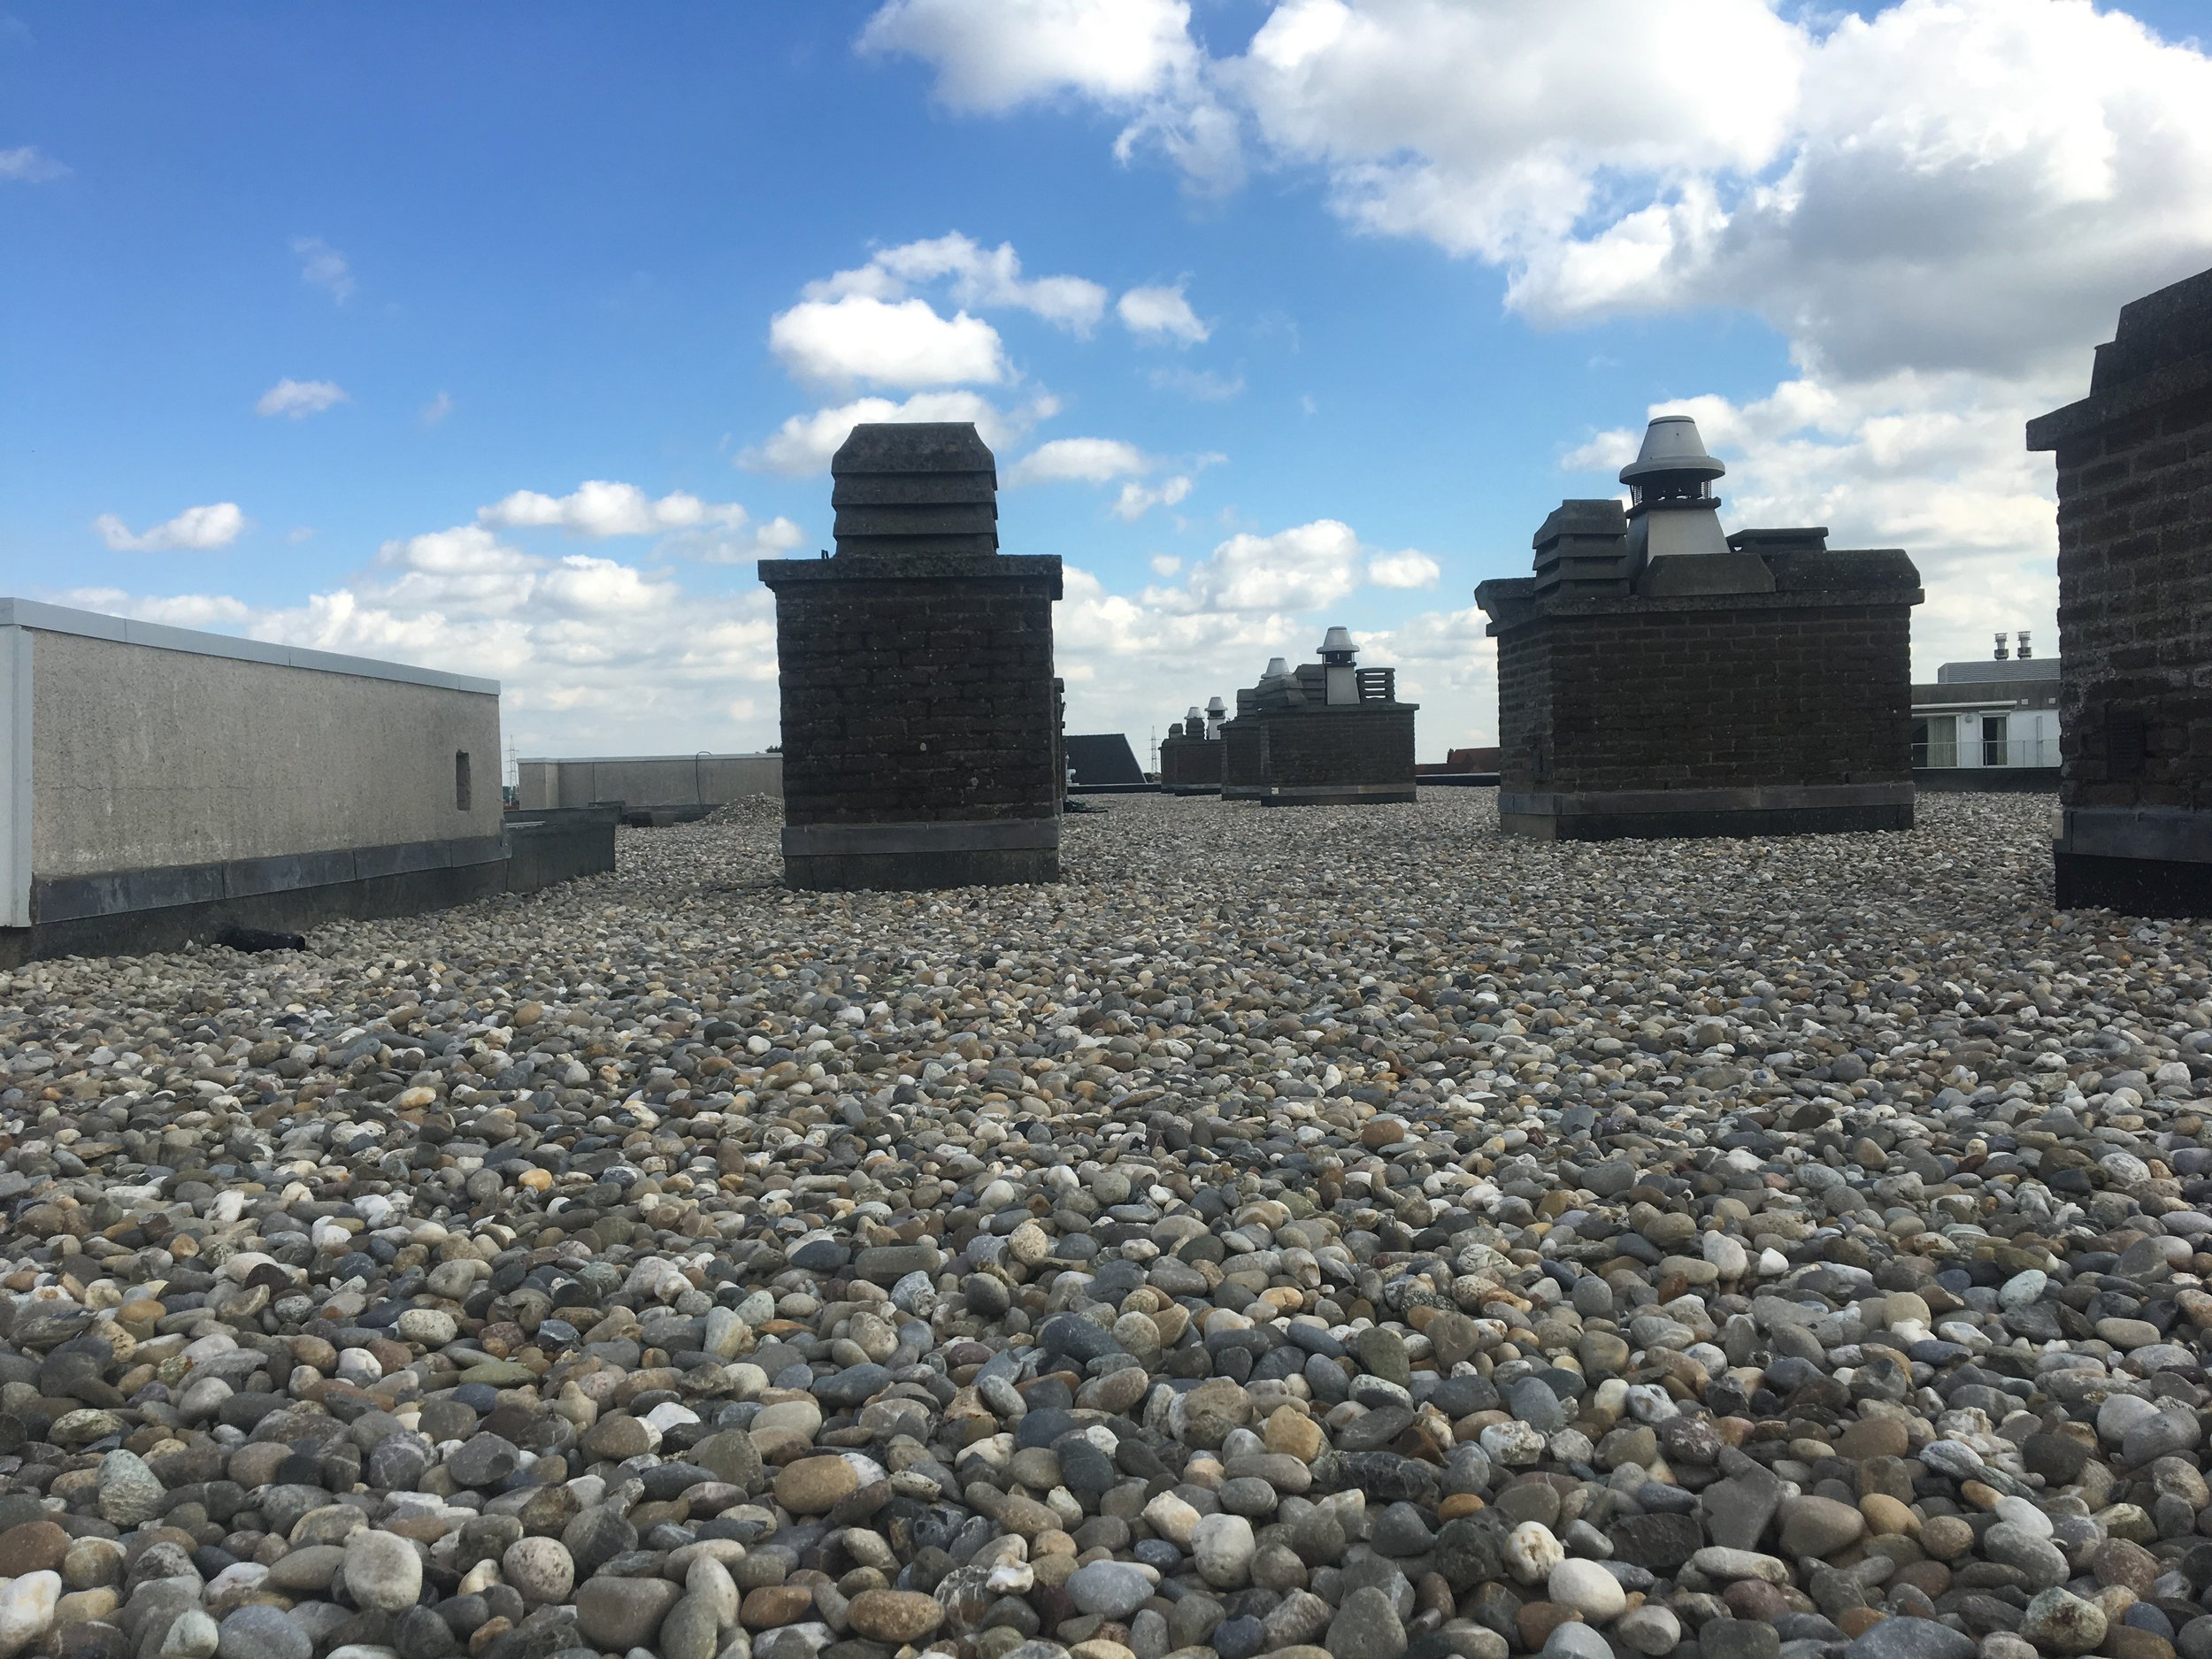 Dakwerken platte daken Roeselare.jpg